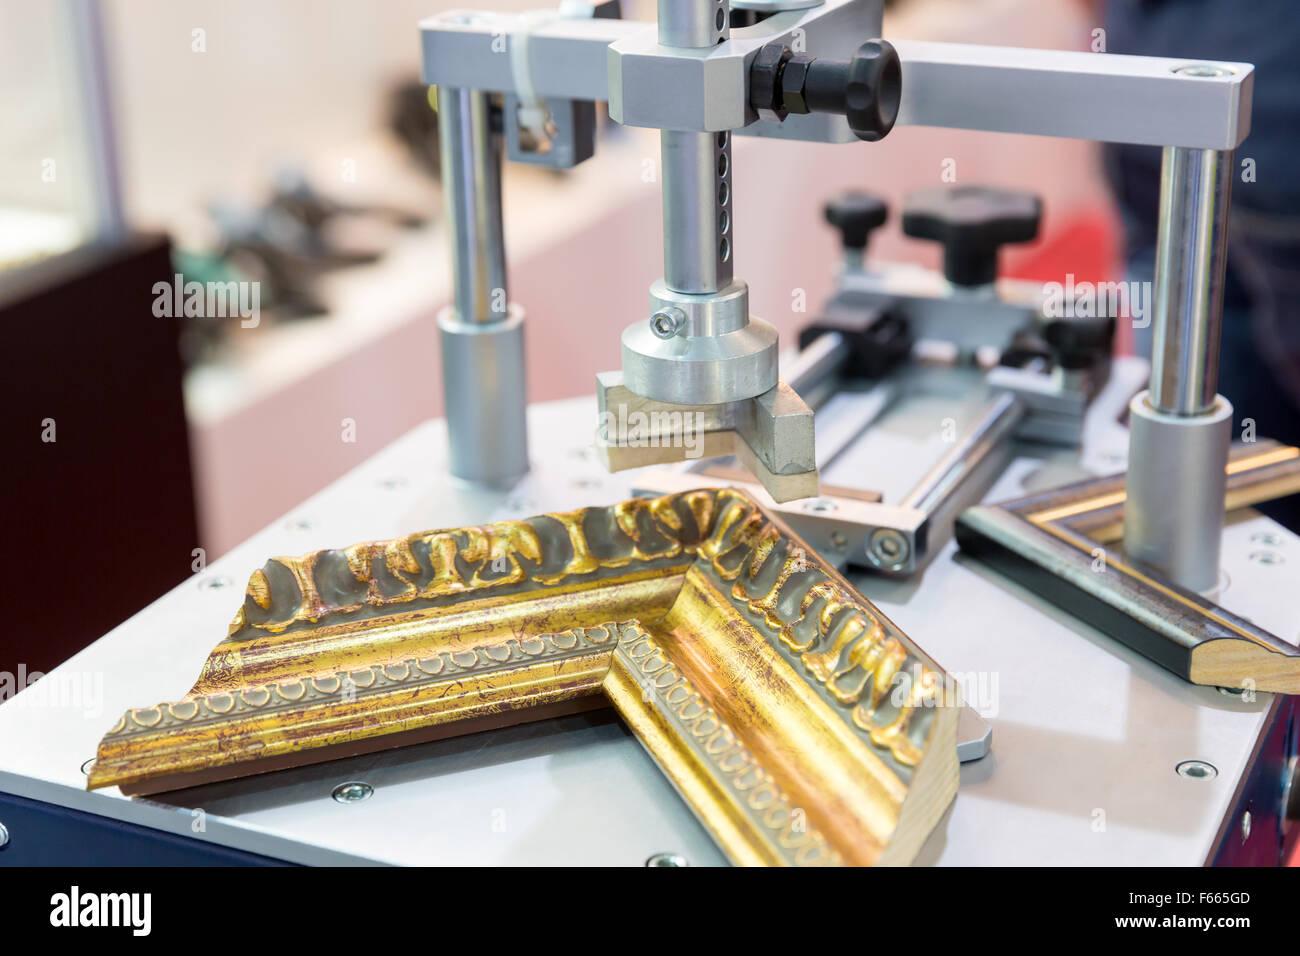 Photo frame making tools closeup Stock Photo: 89875869 - Alamy